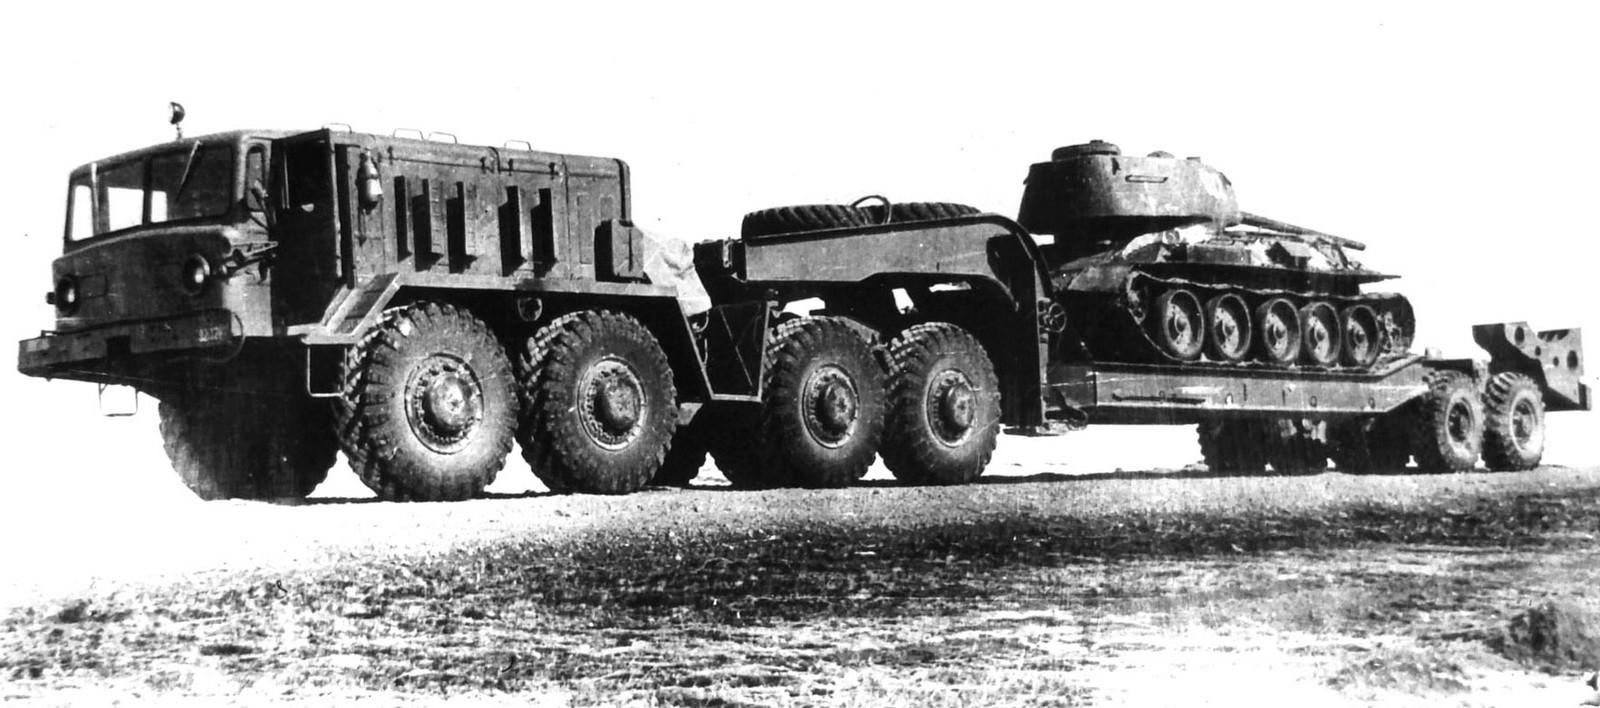 Ранний МАЗ-537Г с танковым полуприцепом МАЗ-5247Г. 1967 год (из архива НИИЦ АТ)